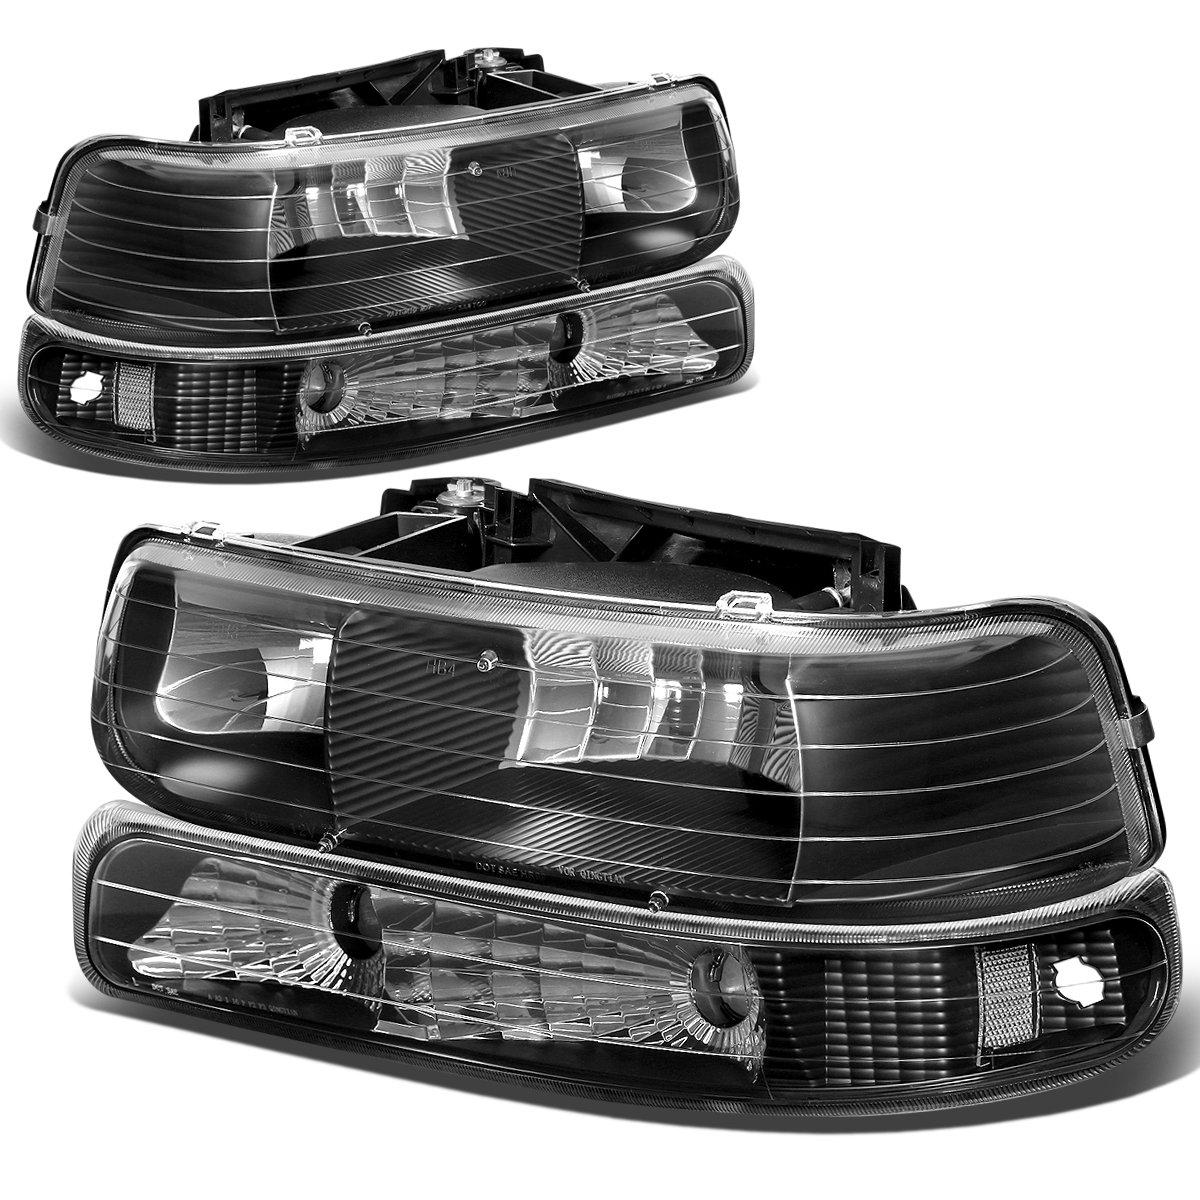 All Chevy 95 chevy headlights : Amazon.com: Chevy Silverado/Tahoe Replacement Headlight/Bumper 4 ...